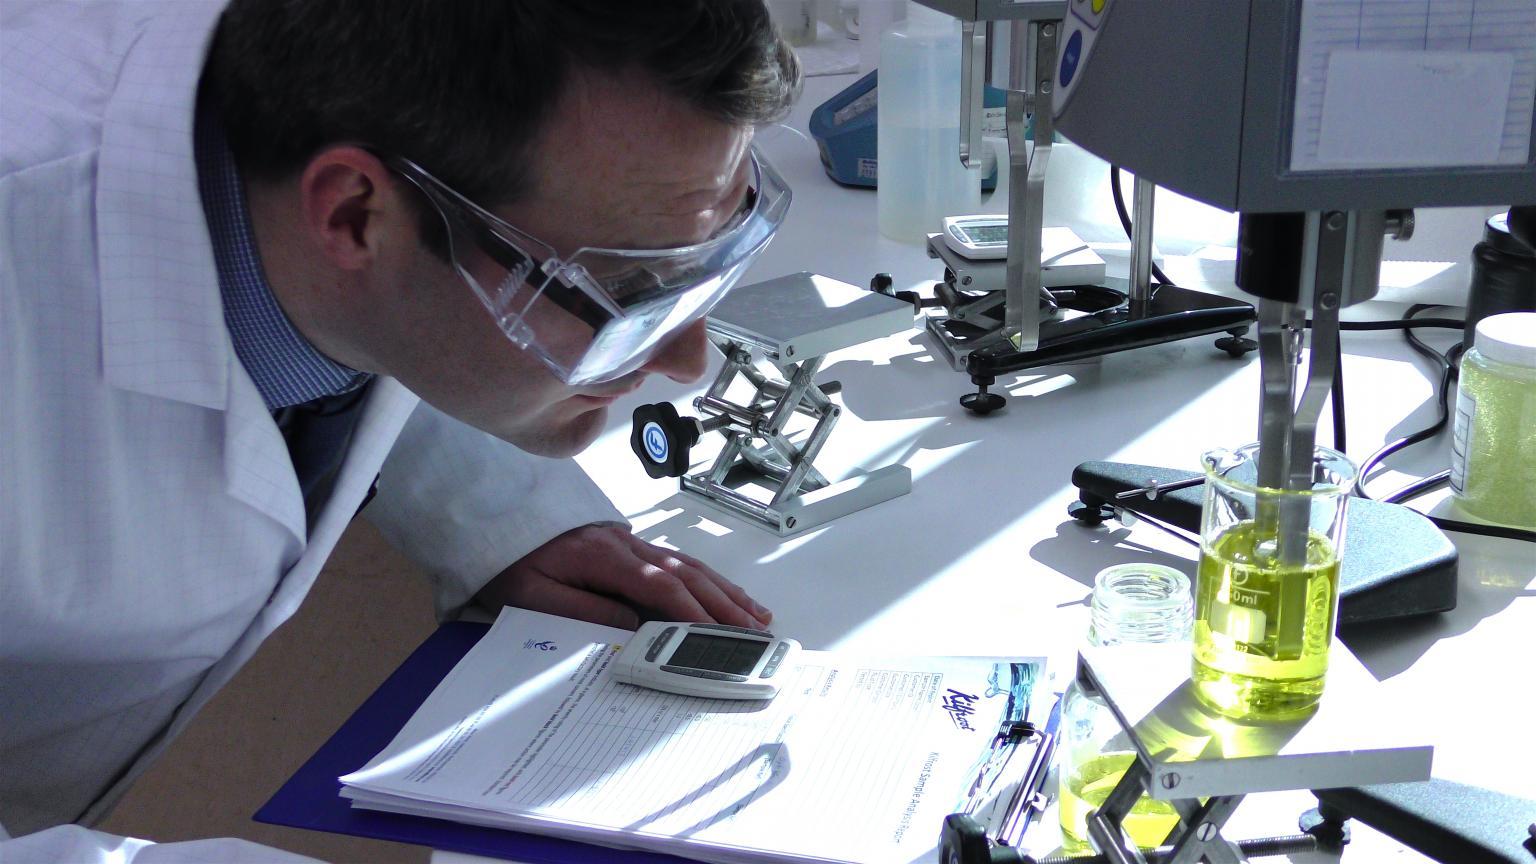 Michael Reynolds at Kilfrost labs